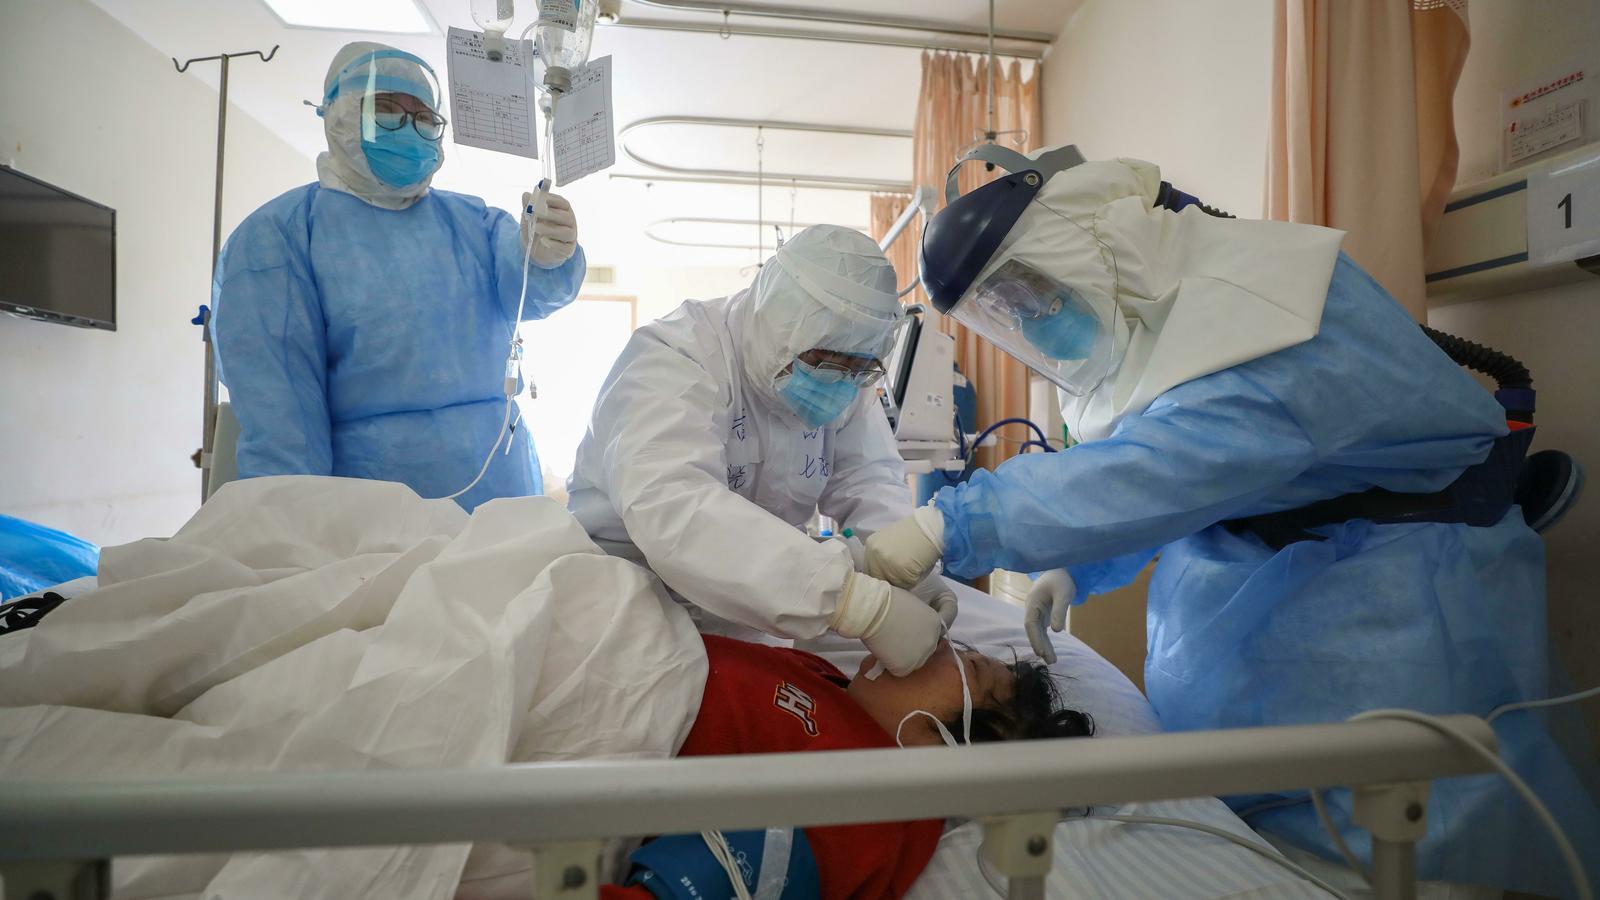 Els sanitaris xinesos: víctimes i herois del coronavirus